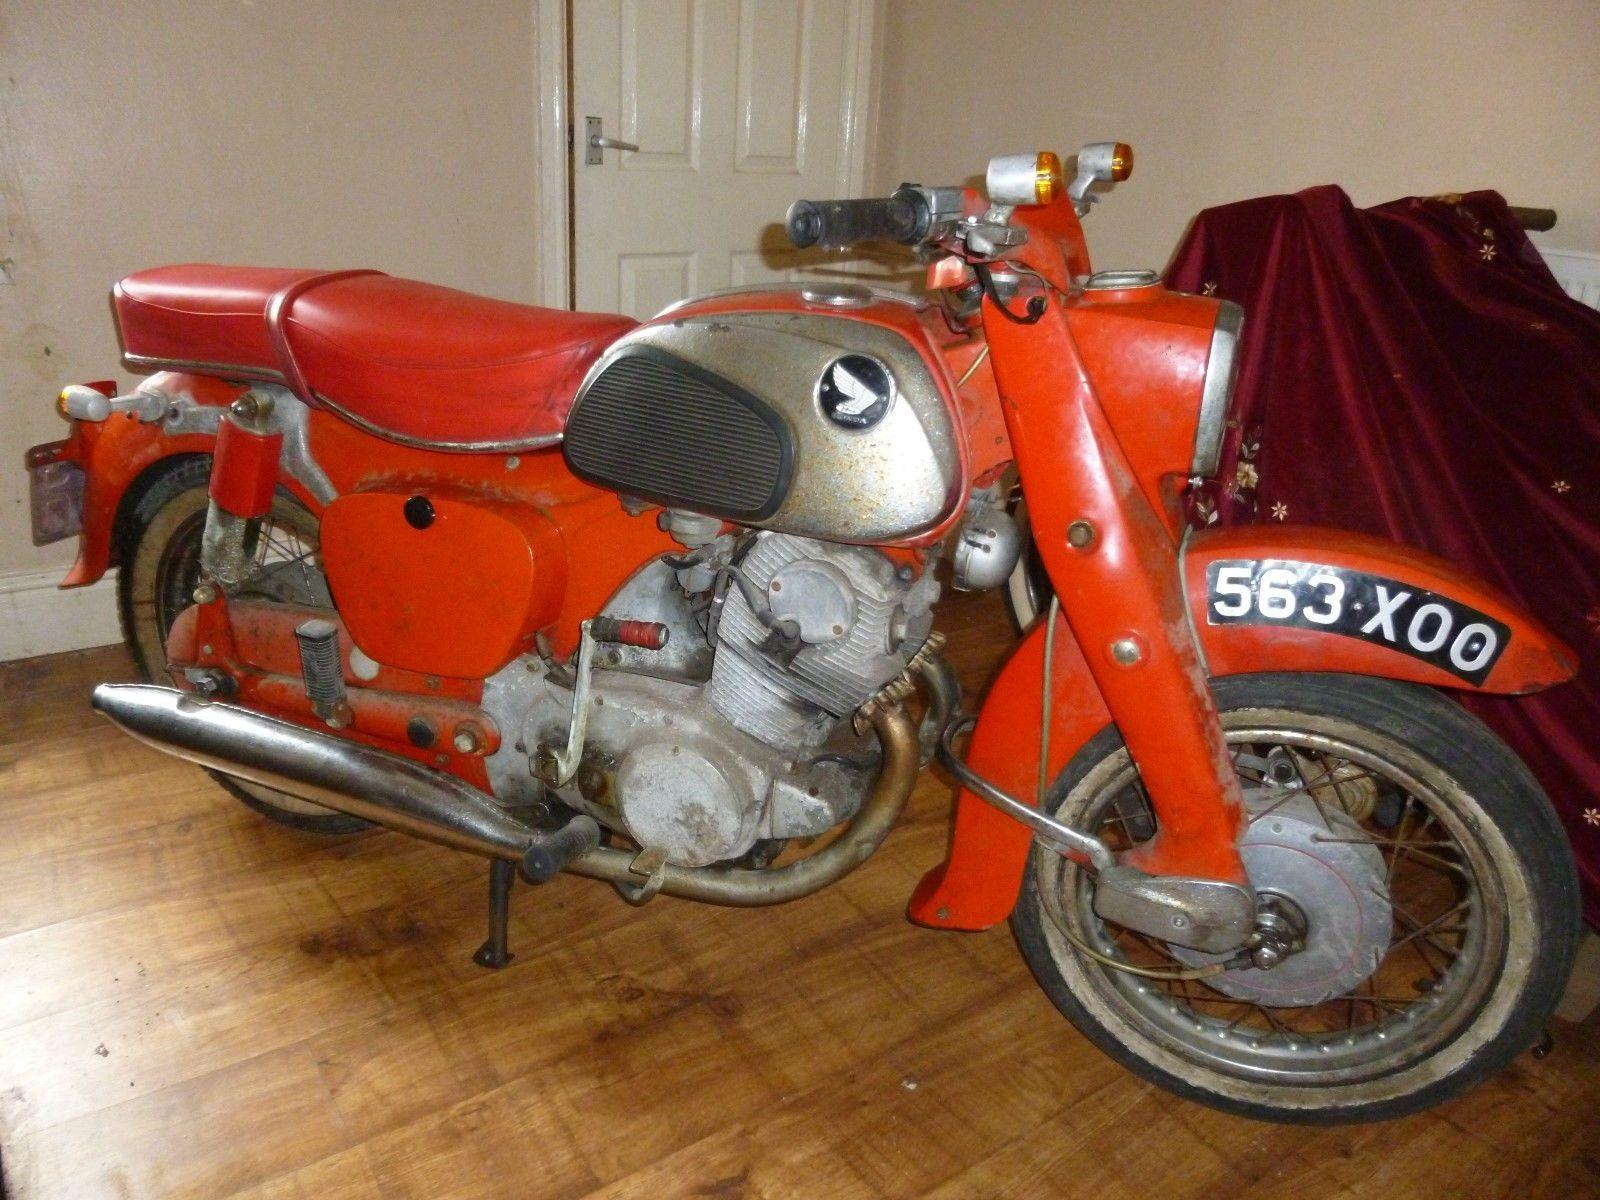 Ebay Honda C72 250cc 1962 Model Registered New In Uk In 1963 For Restoration Vintage Motorcycle Honda Motorcycle